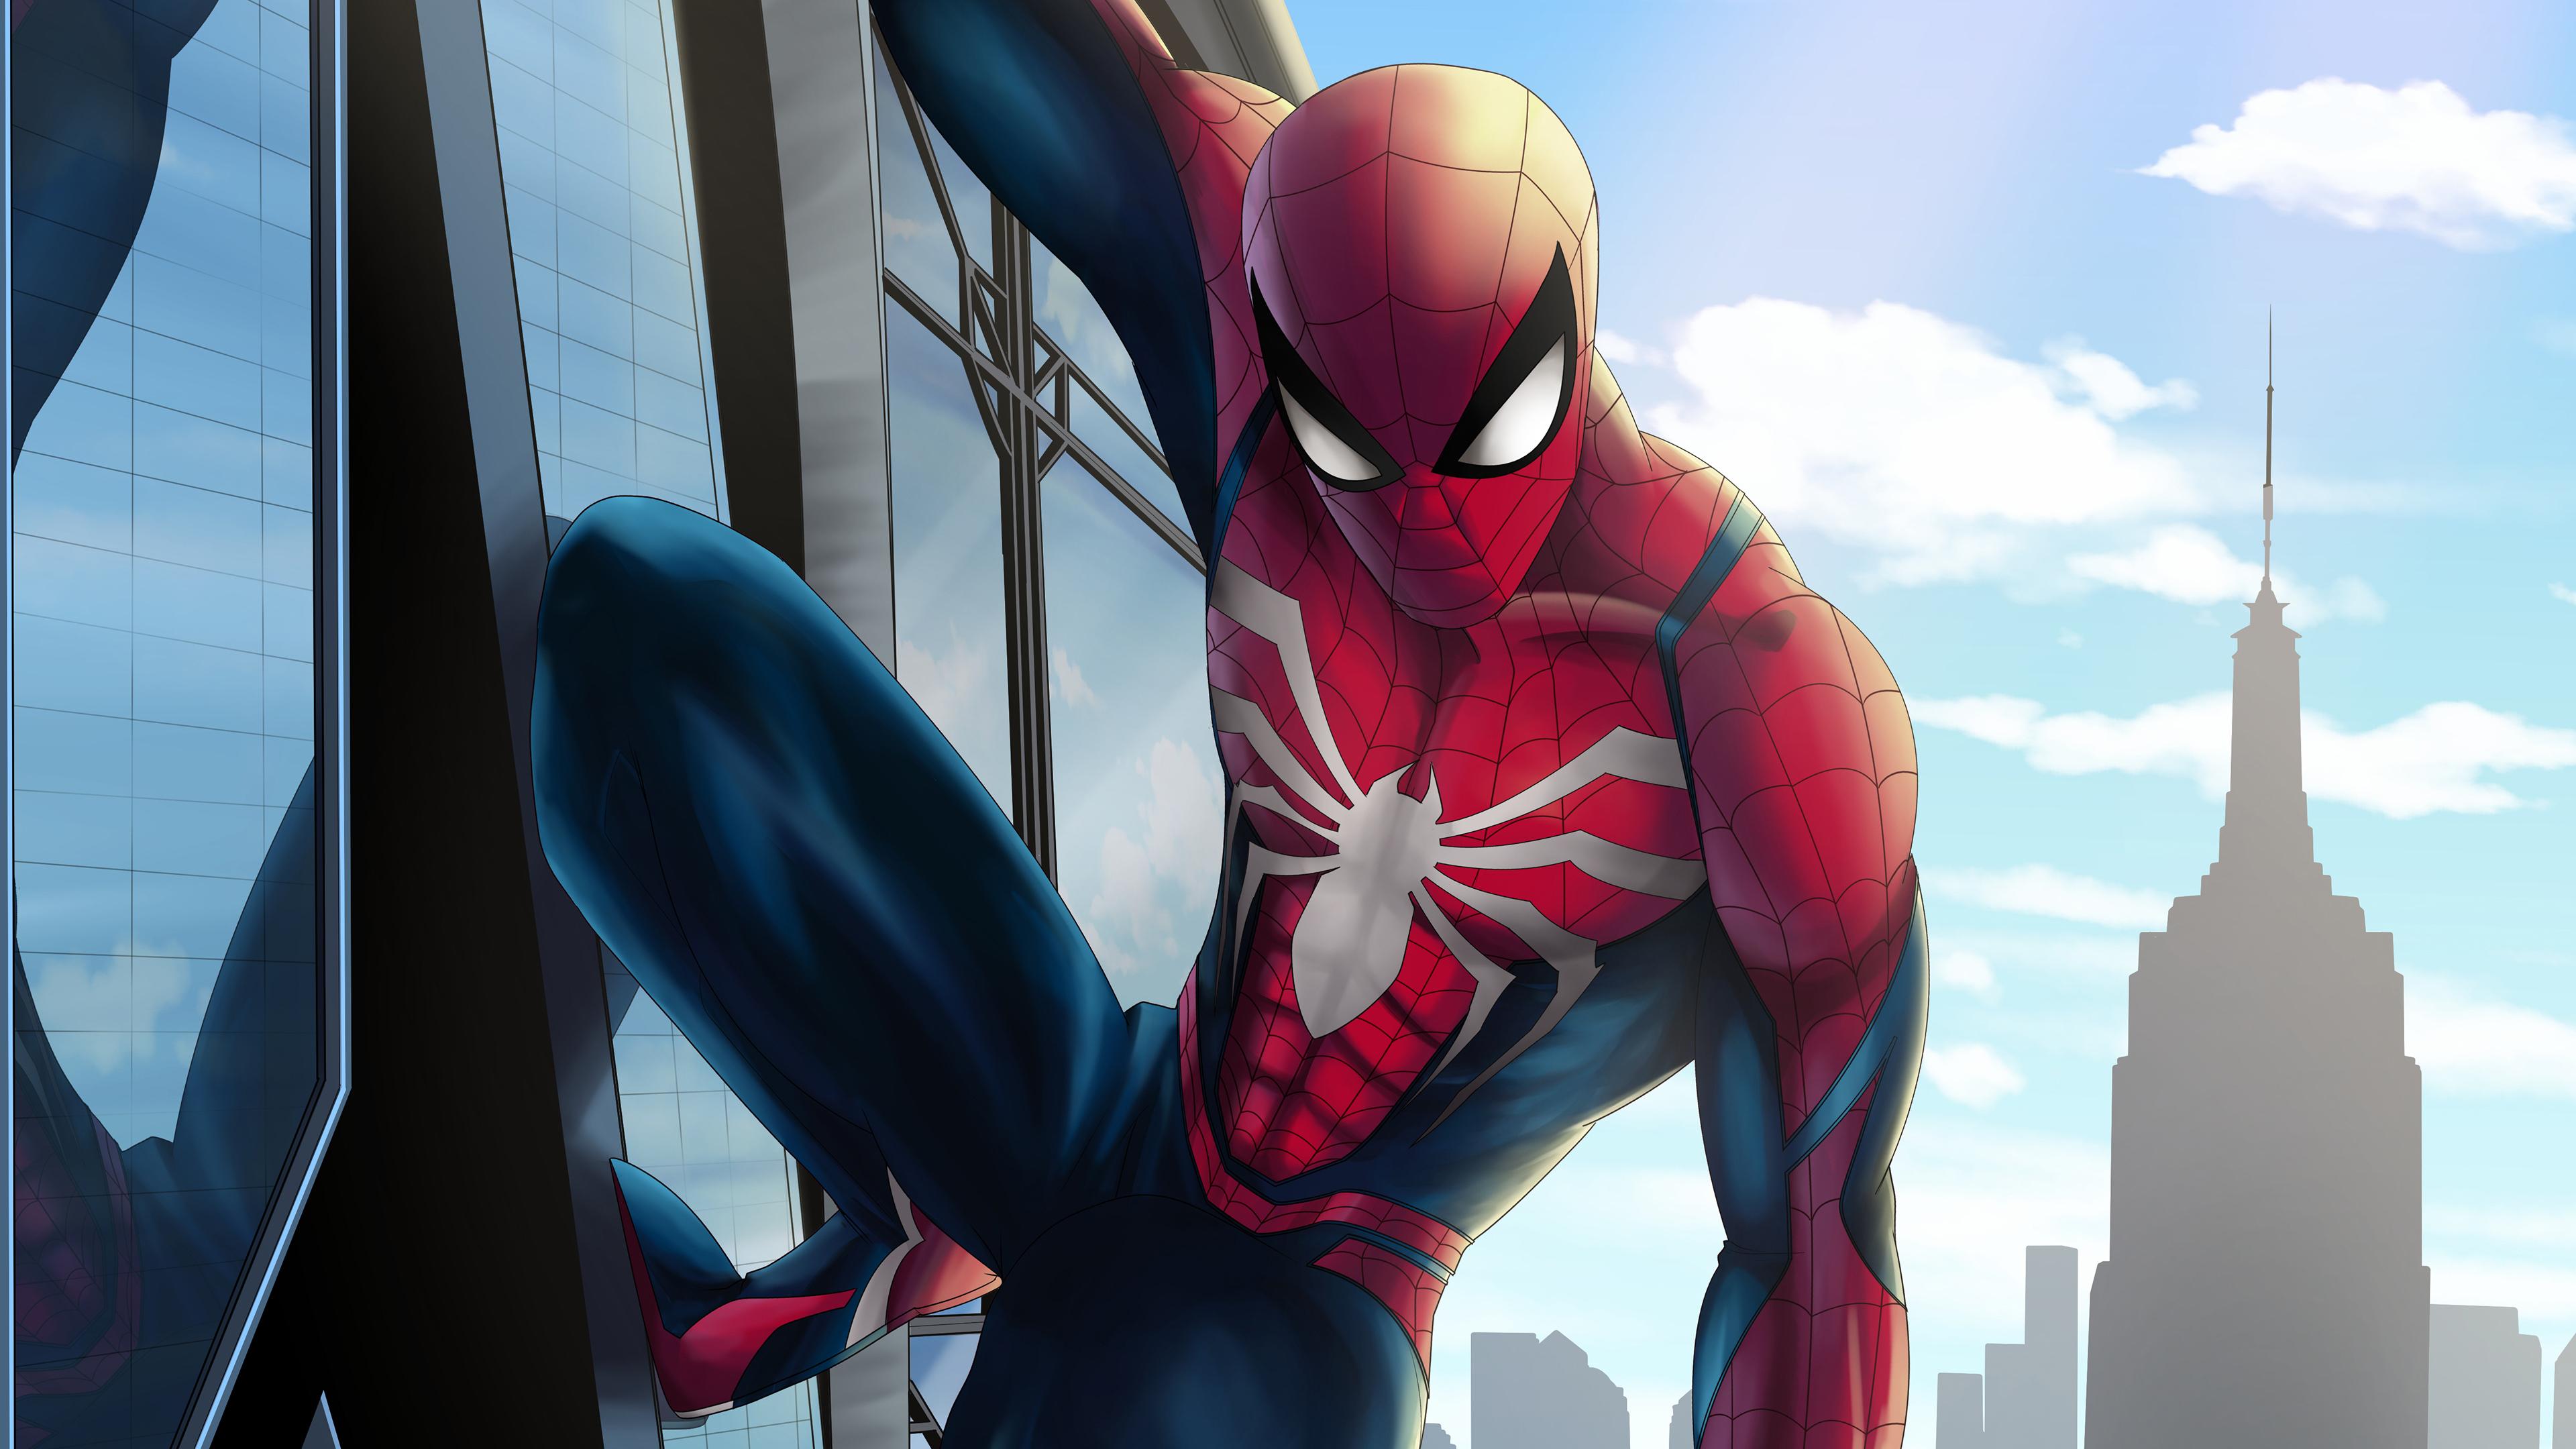 insomniac spiderman 4k 1554244909 - Insomniac Spiderman 4k - superheroes wallpapers, spiderman wallpapers, hd-wallpapers, digital art wallpapers, behance wallpapers, artwork wallpapers, artist wallpapers